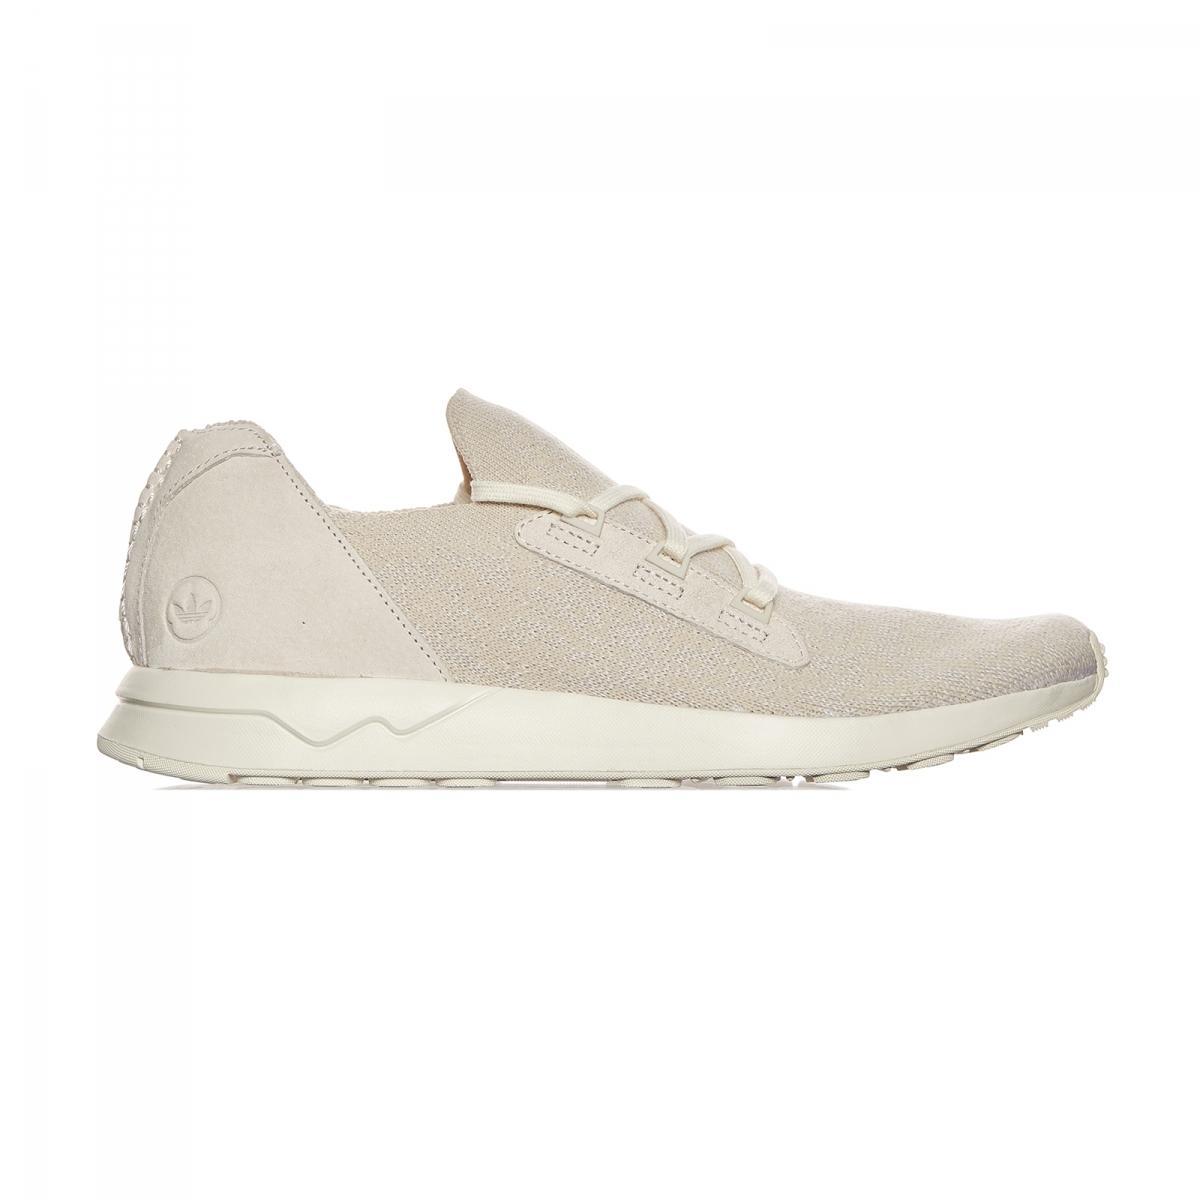 lyst adidas originali ali & corna zx flusso primeknit sneakers in